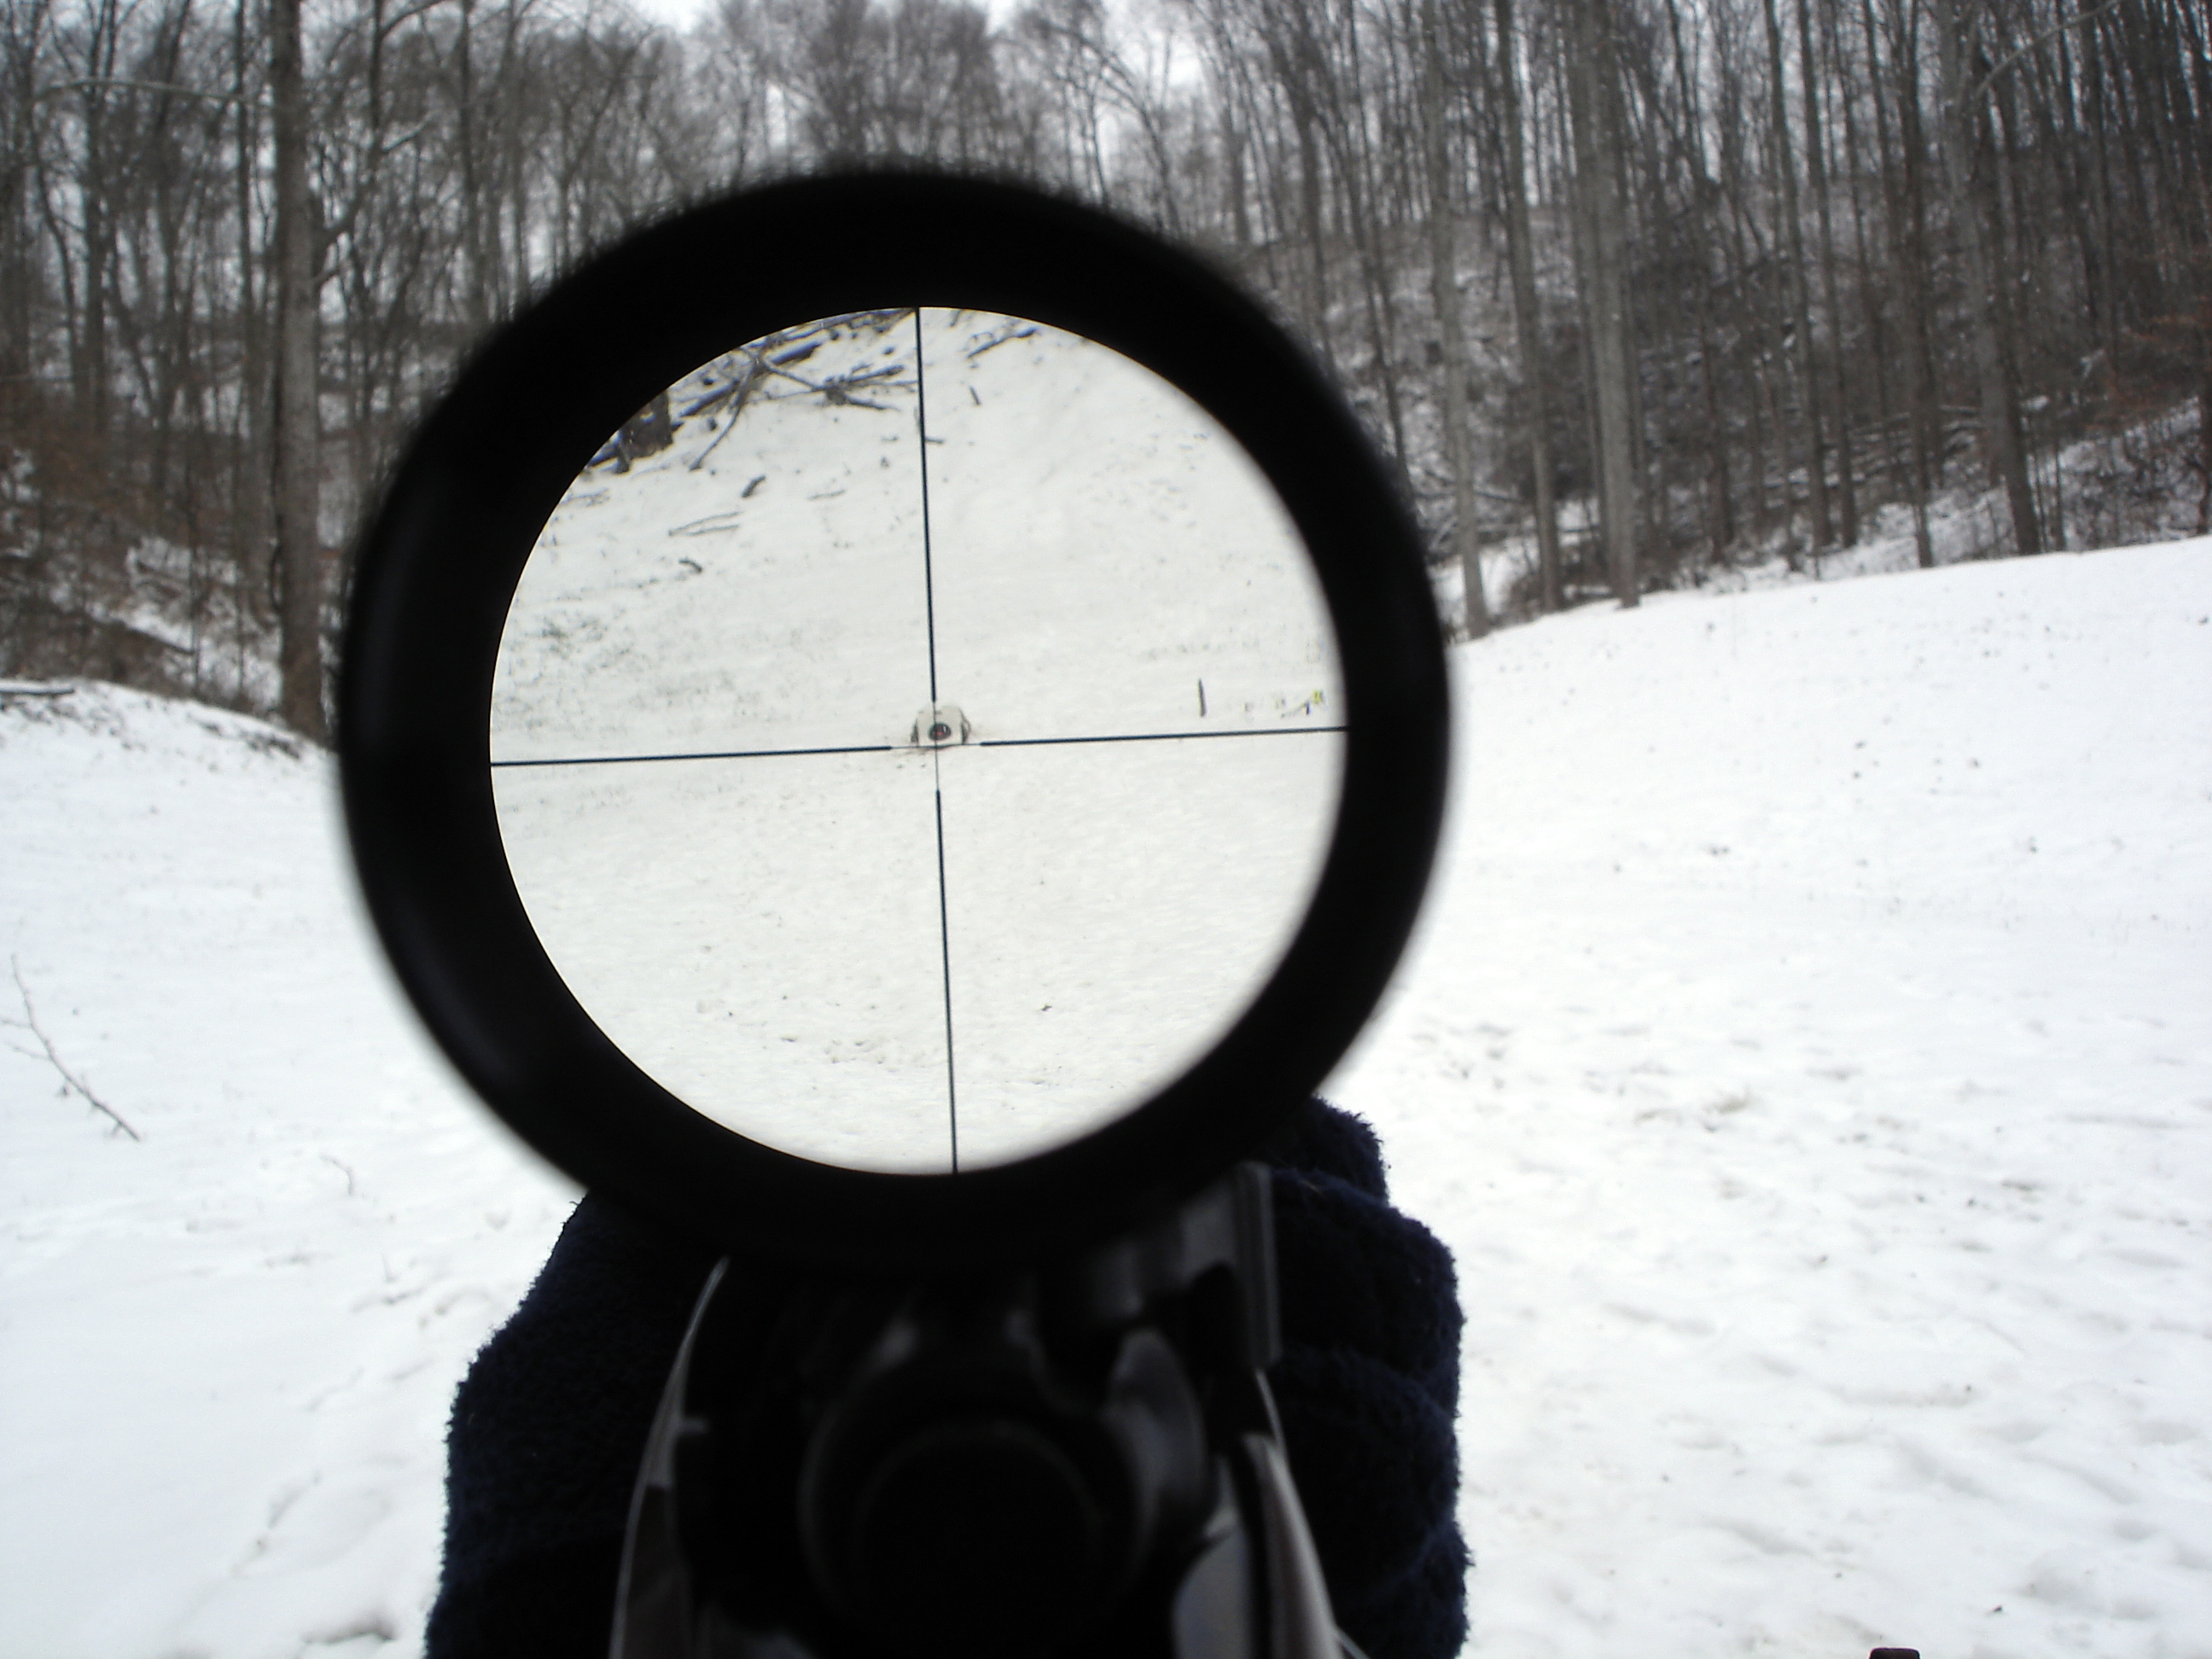 Rifle Scope View